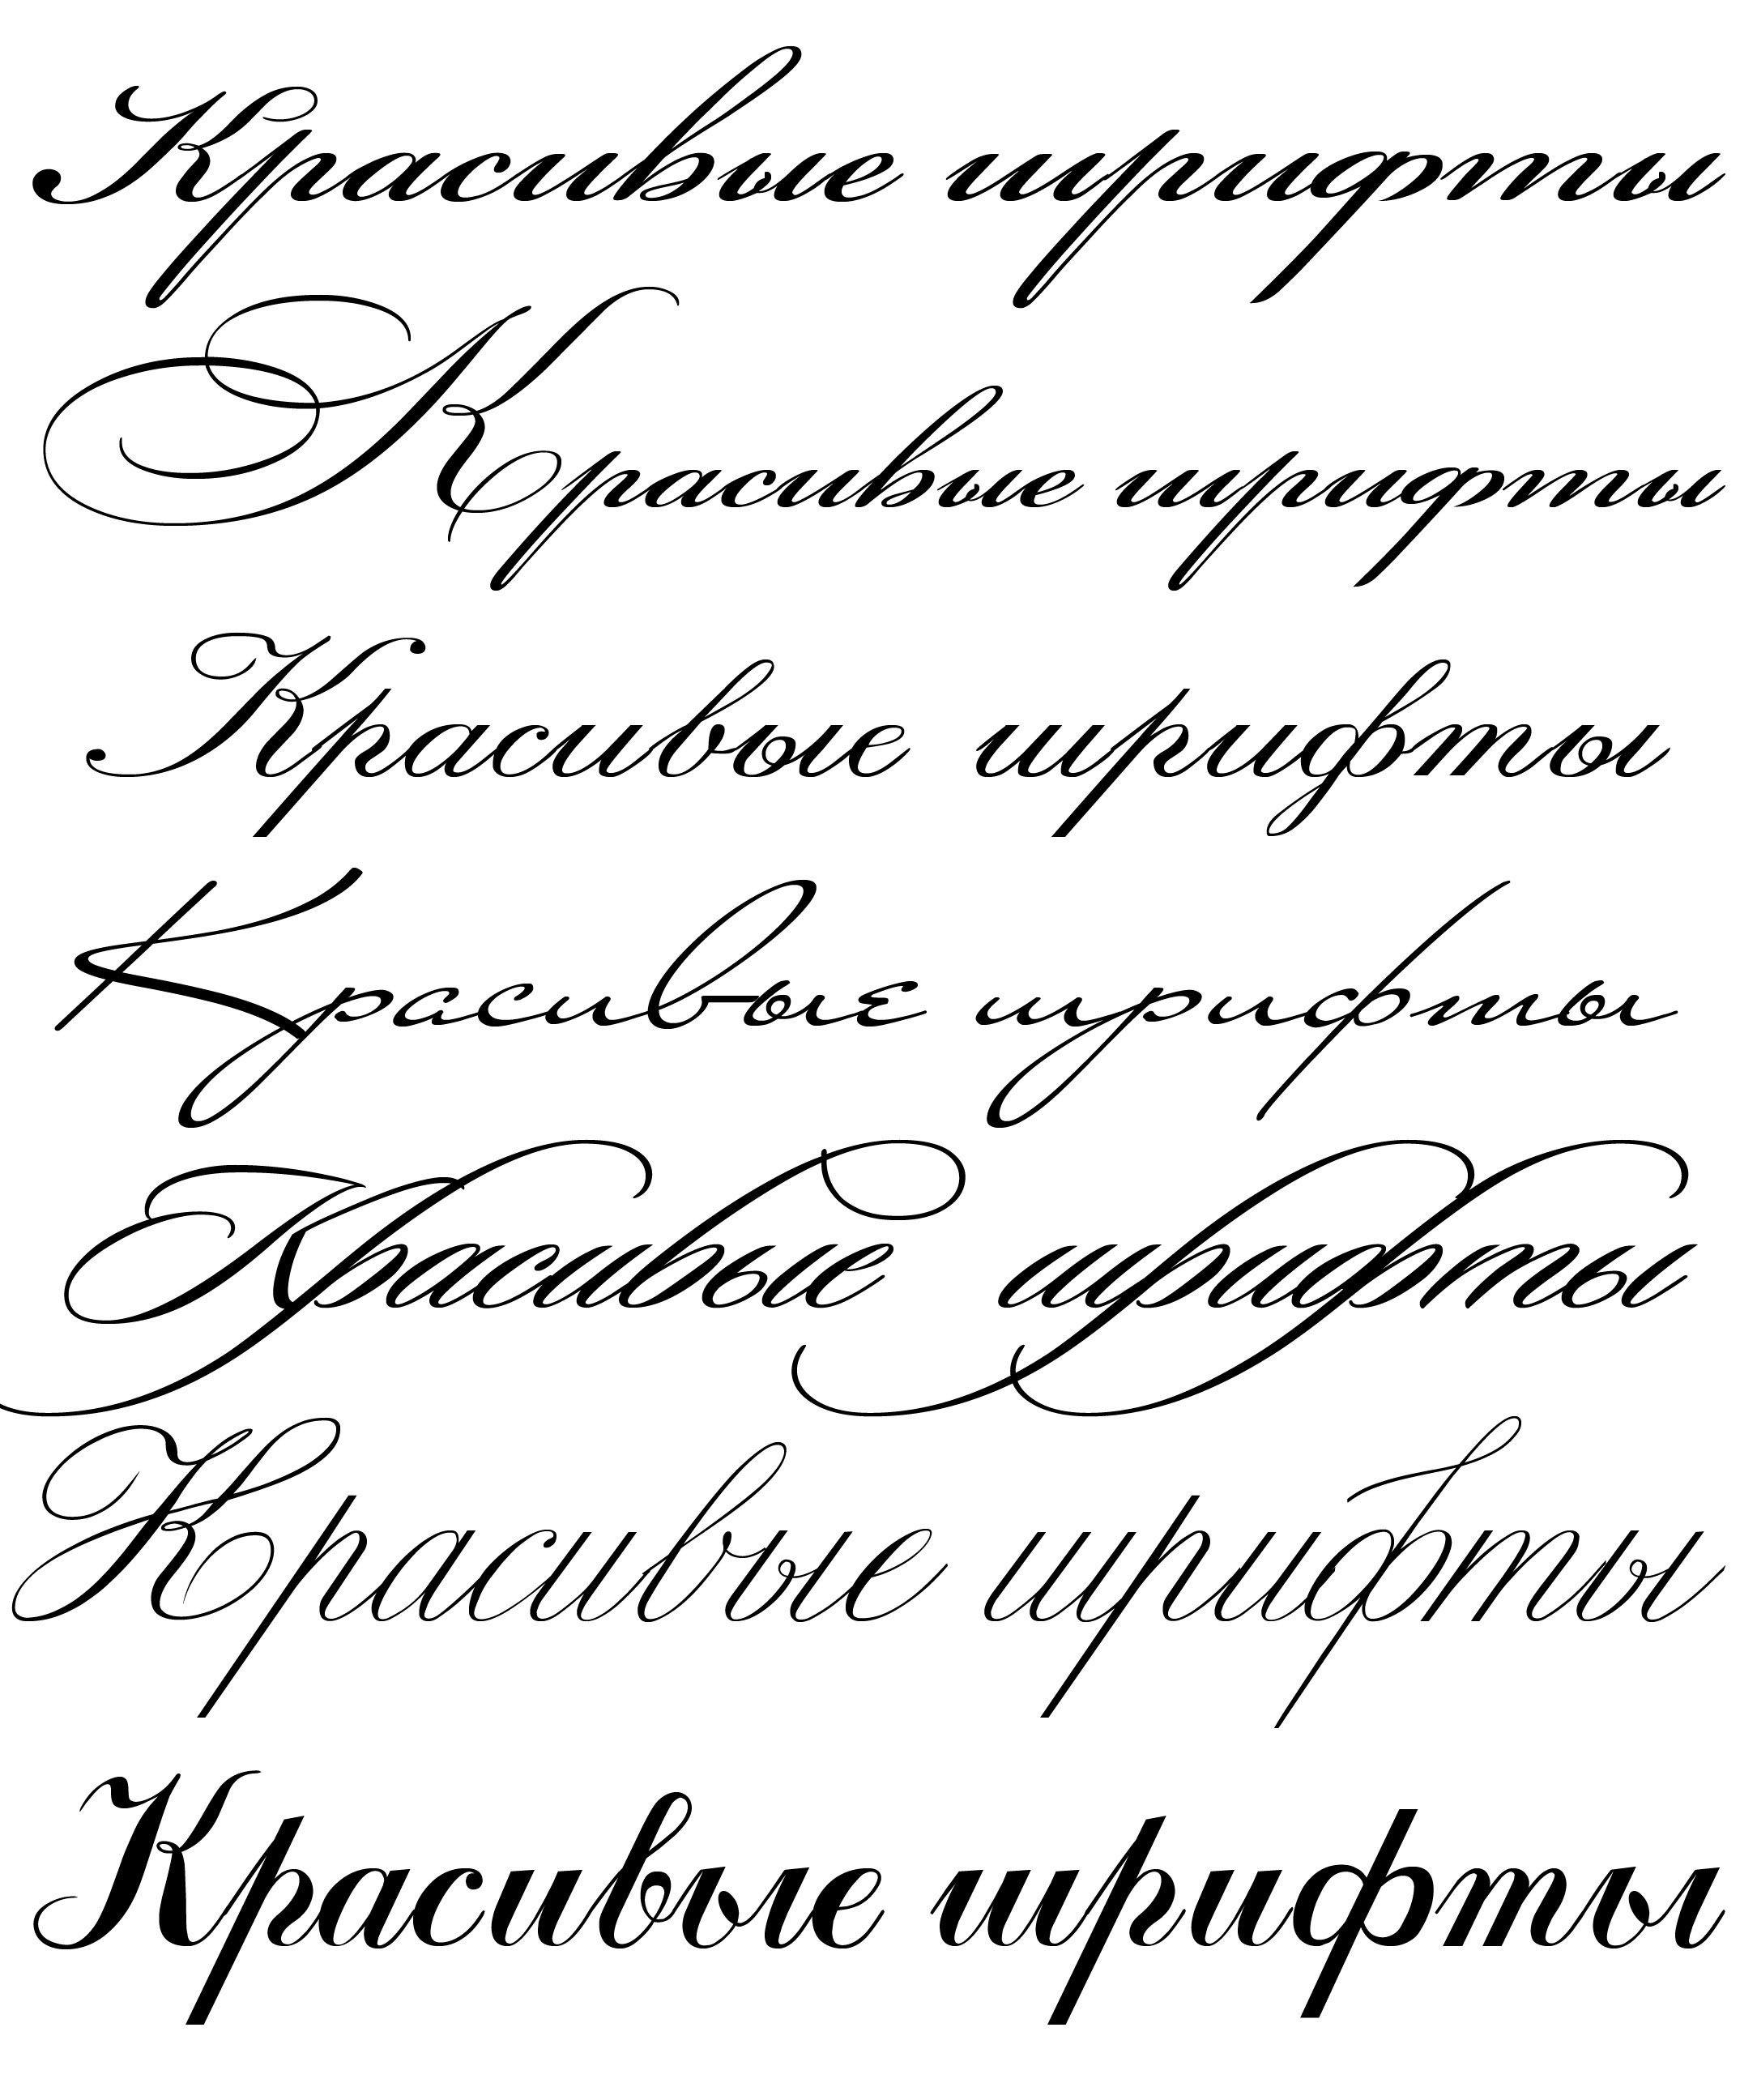 Шрифты онлайн для открыток